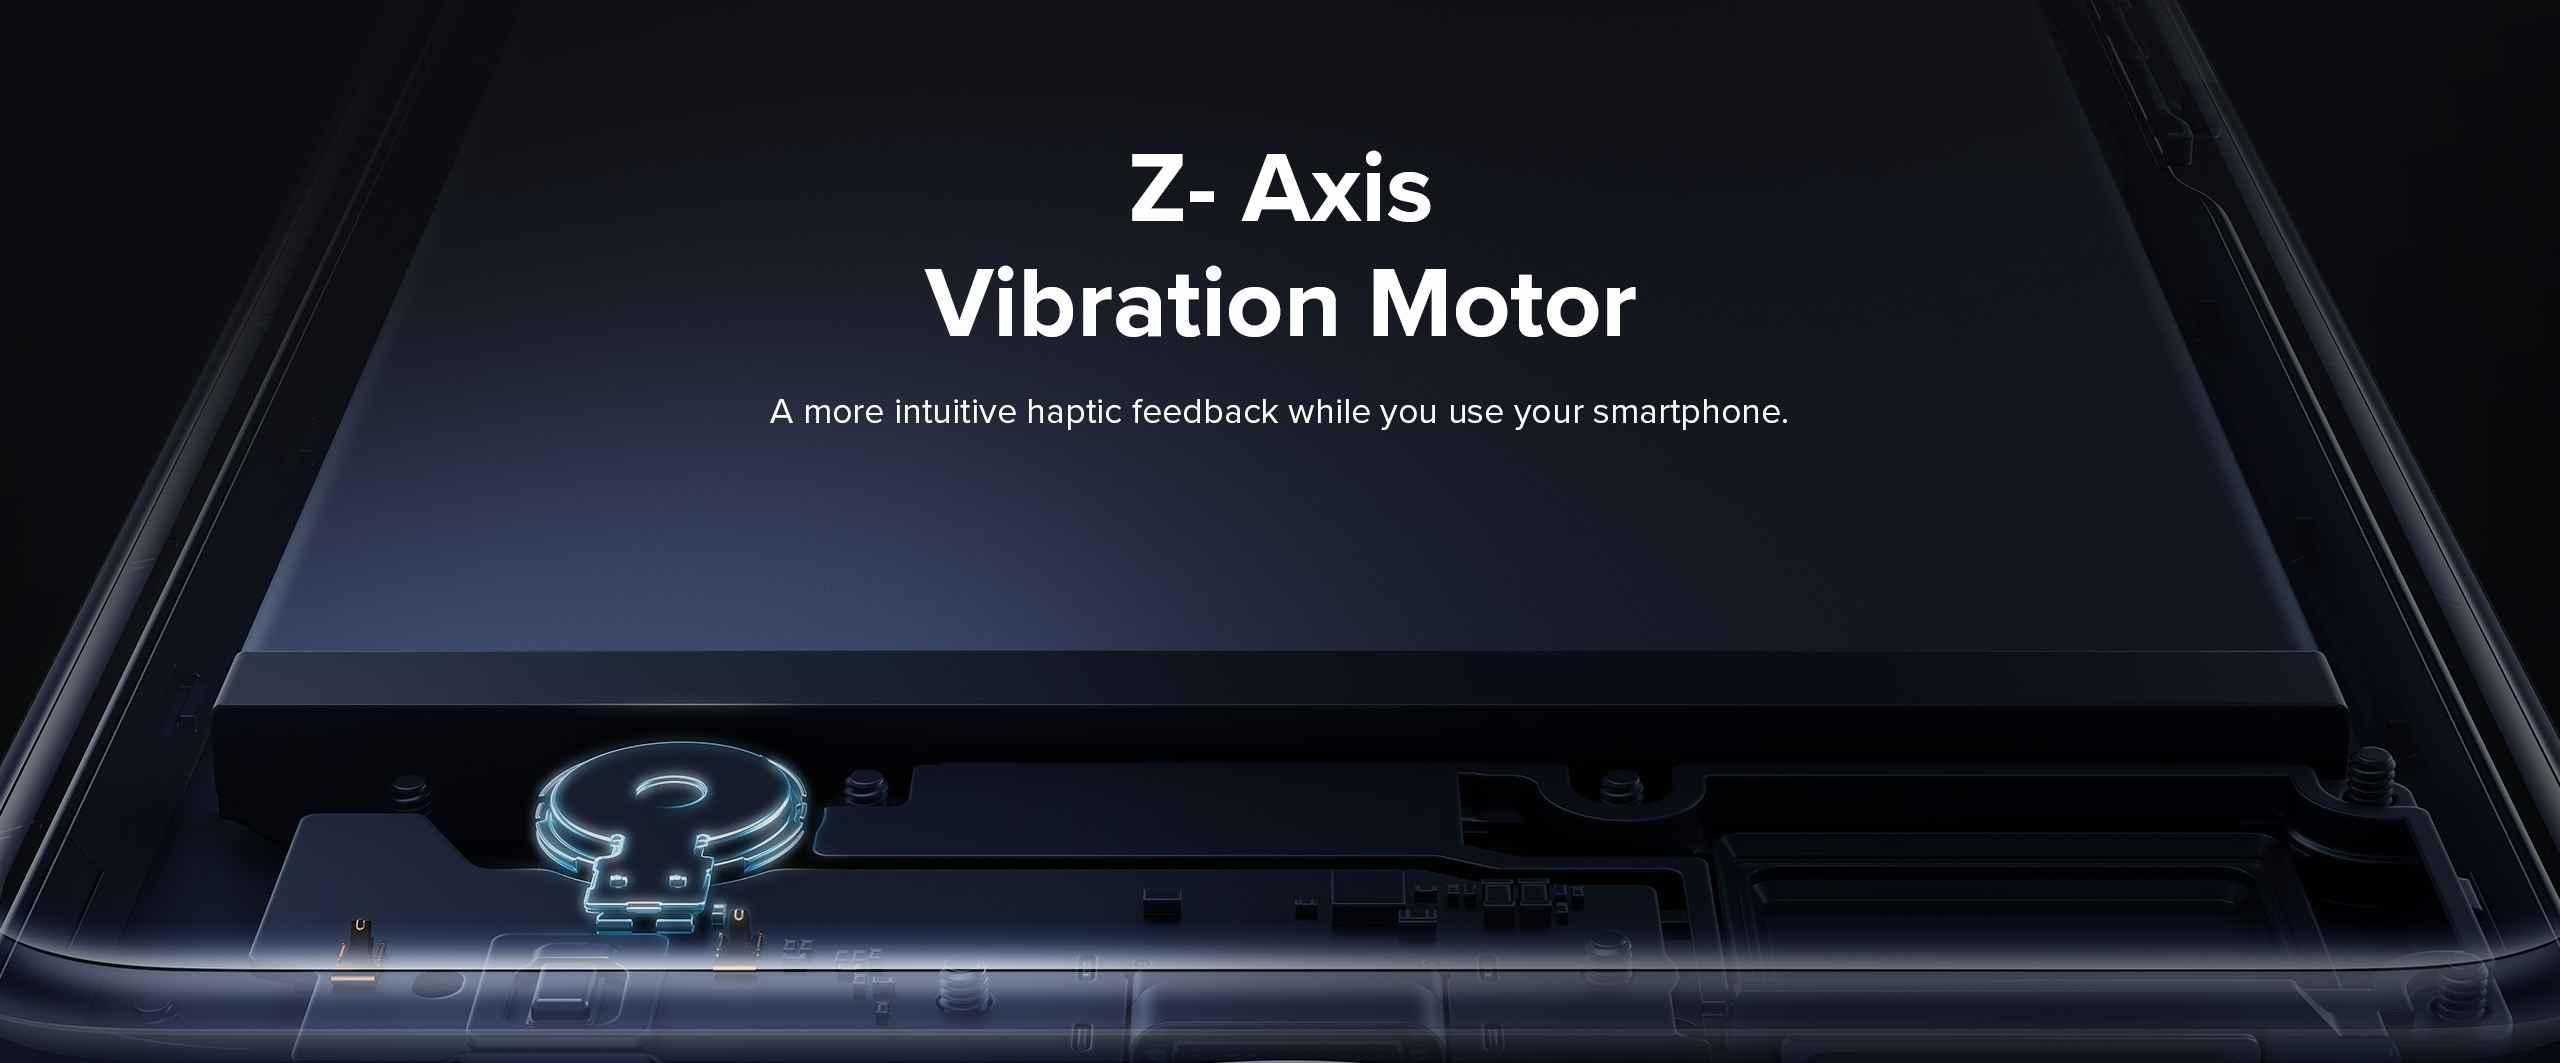 Redmi vibration motor